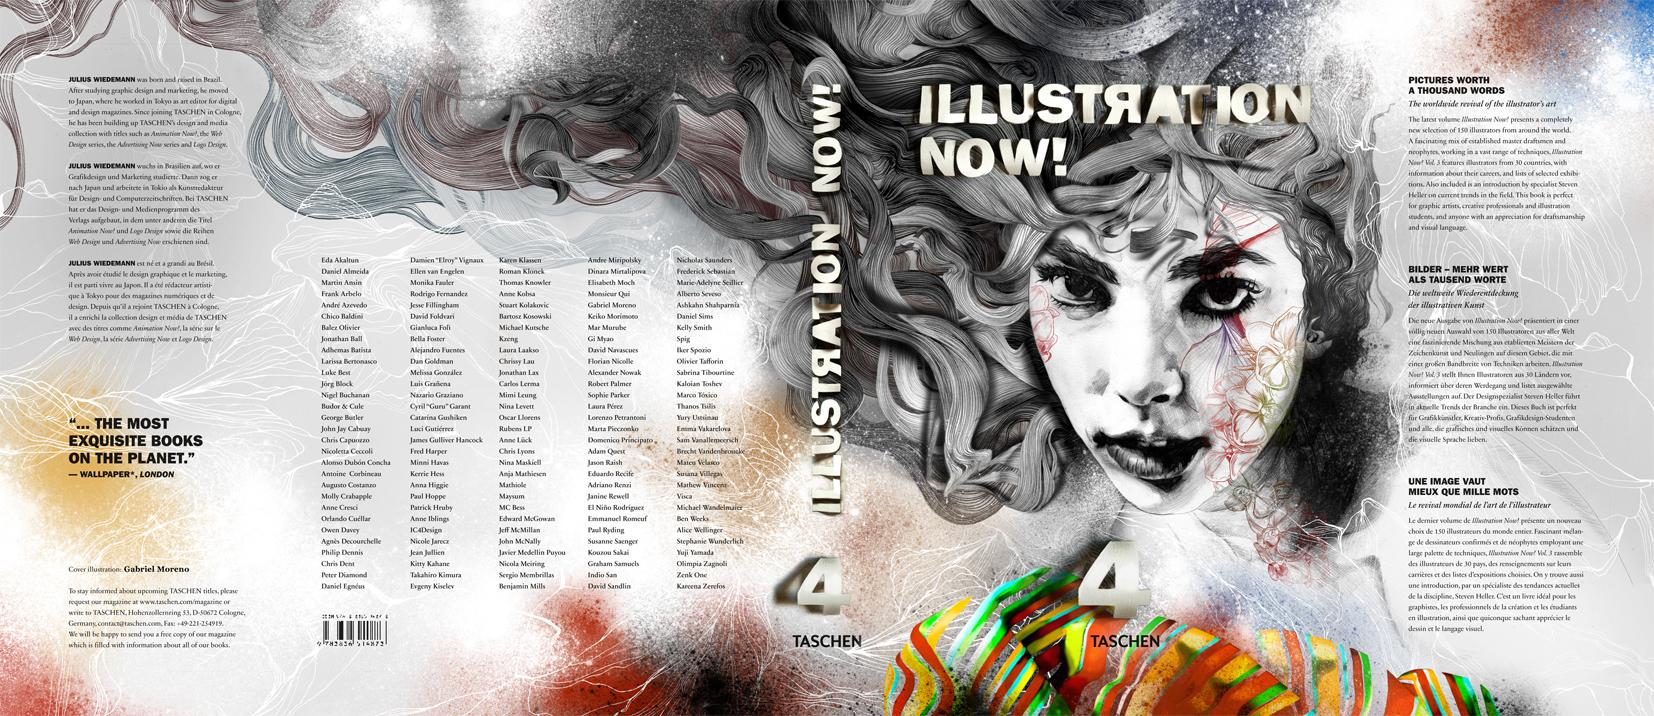 Illustration Now!